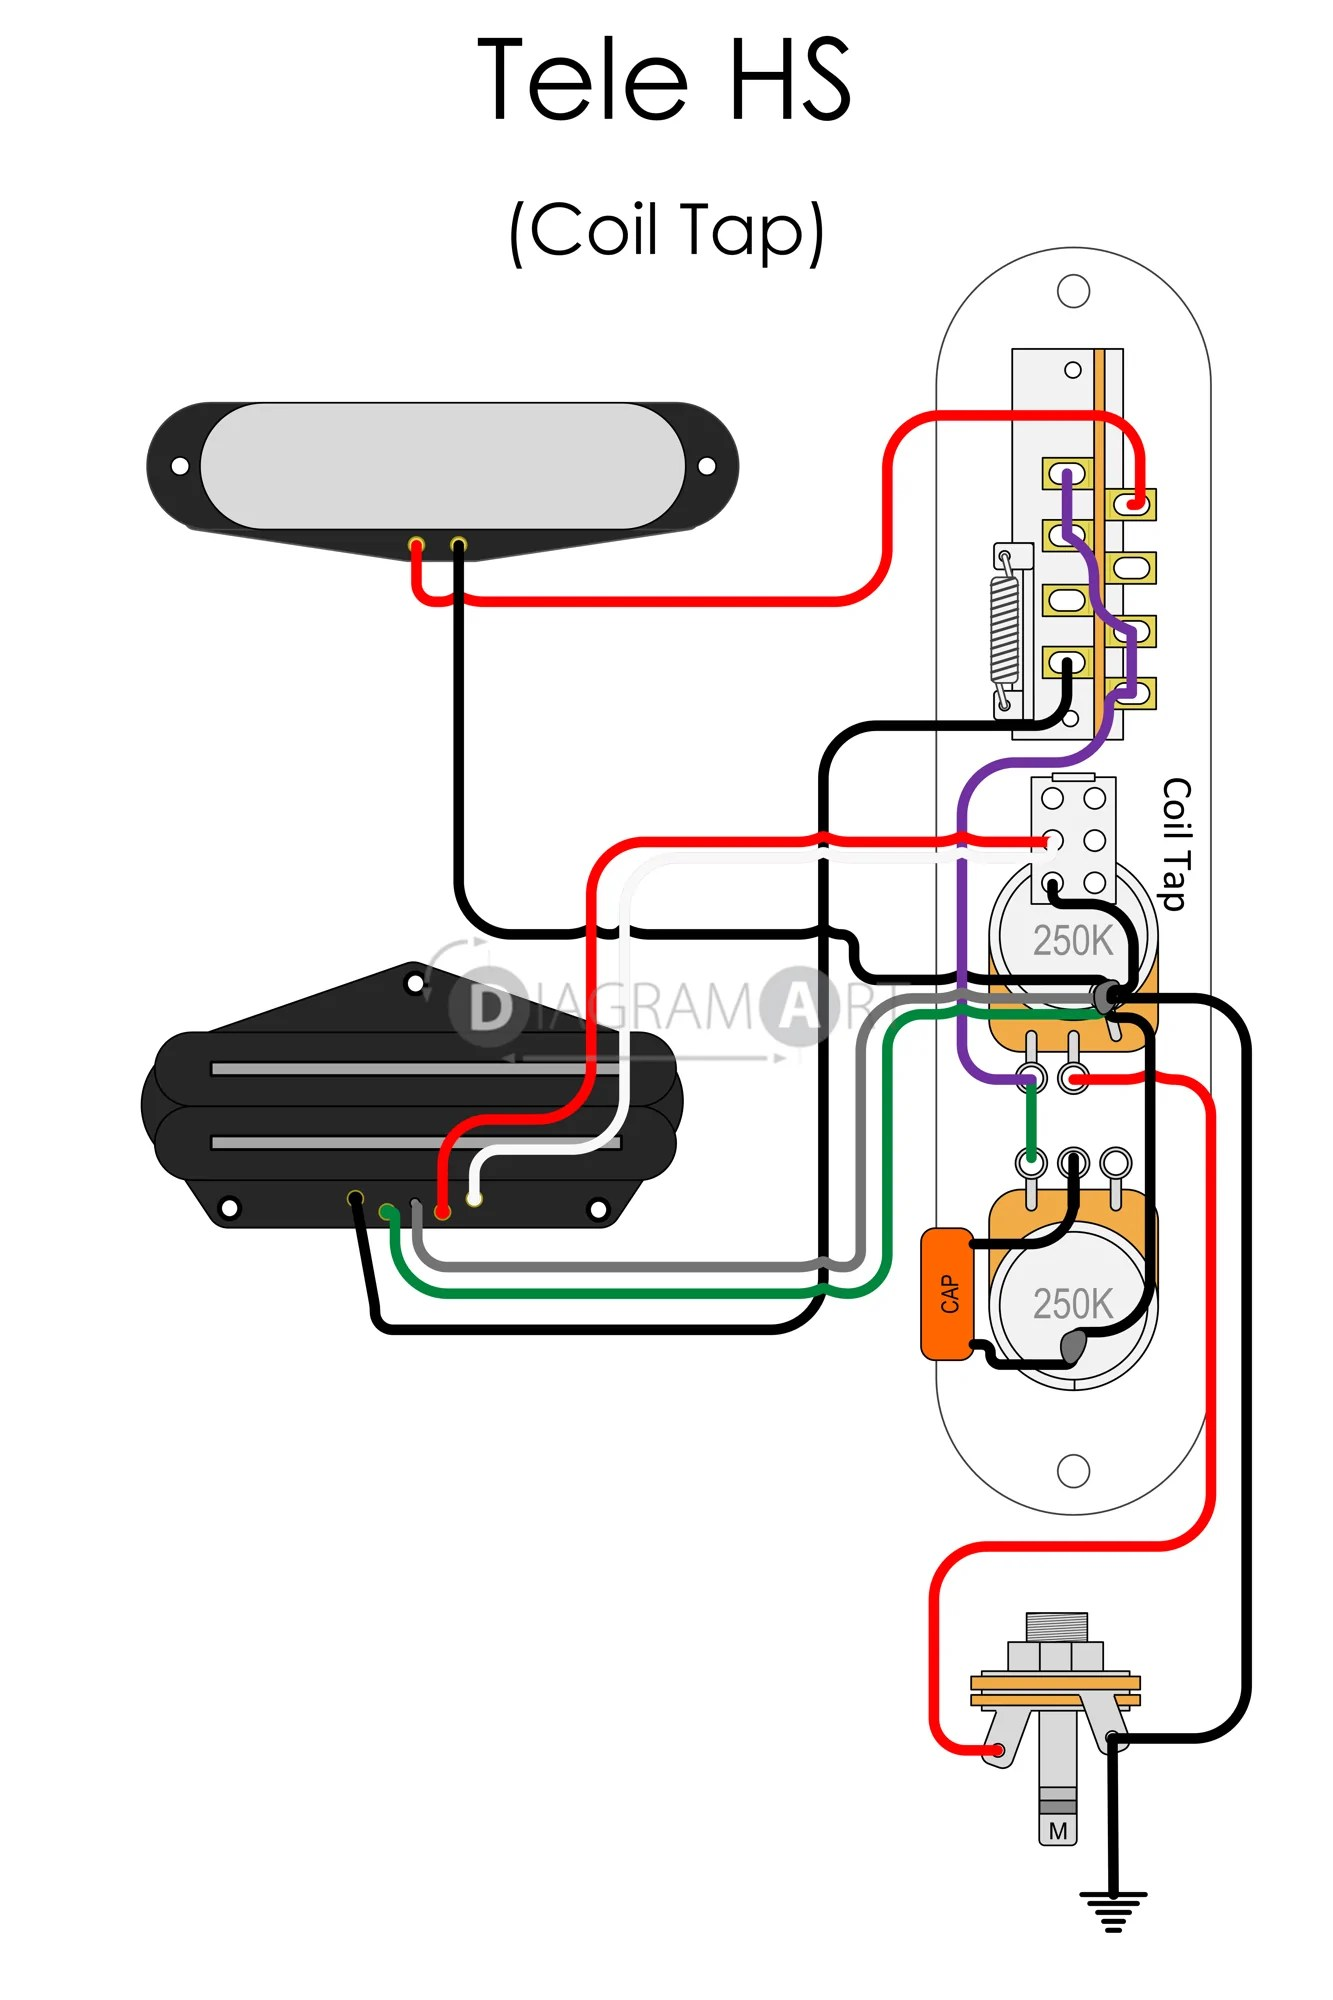 electric guitar wiring tele hs coil tap electric circuit hs tele wiring diagram [ 1333 x 2000 Pixel ]